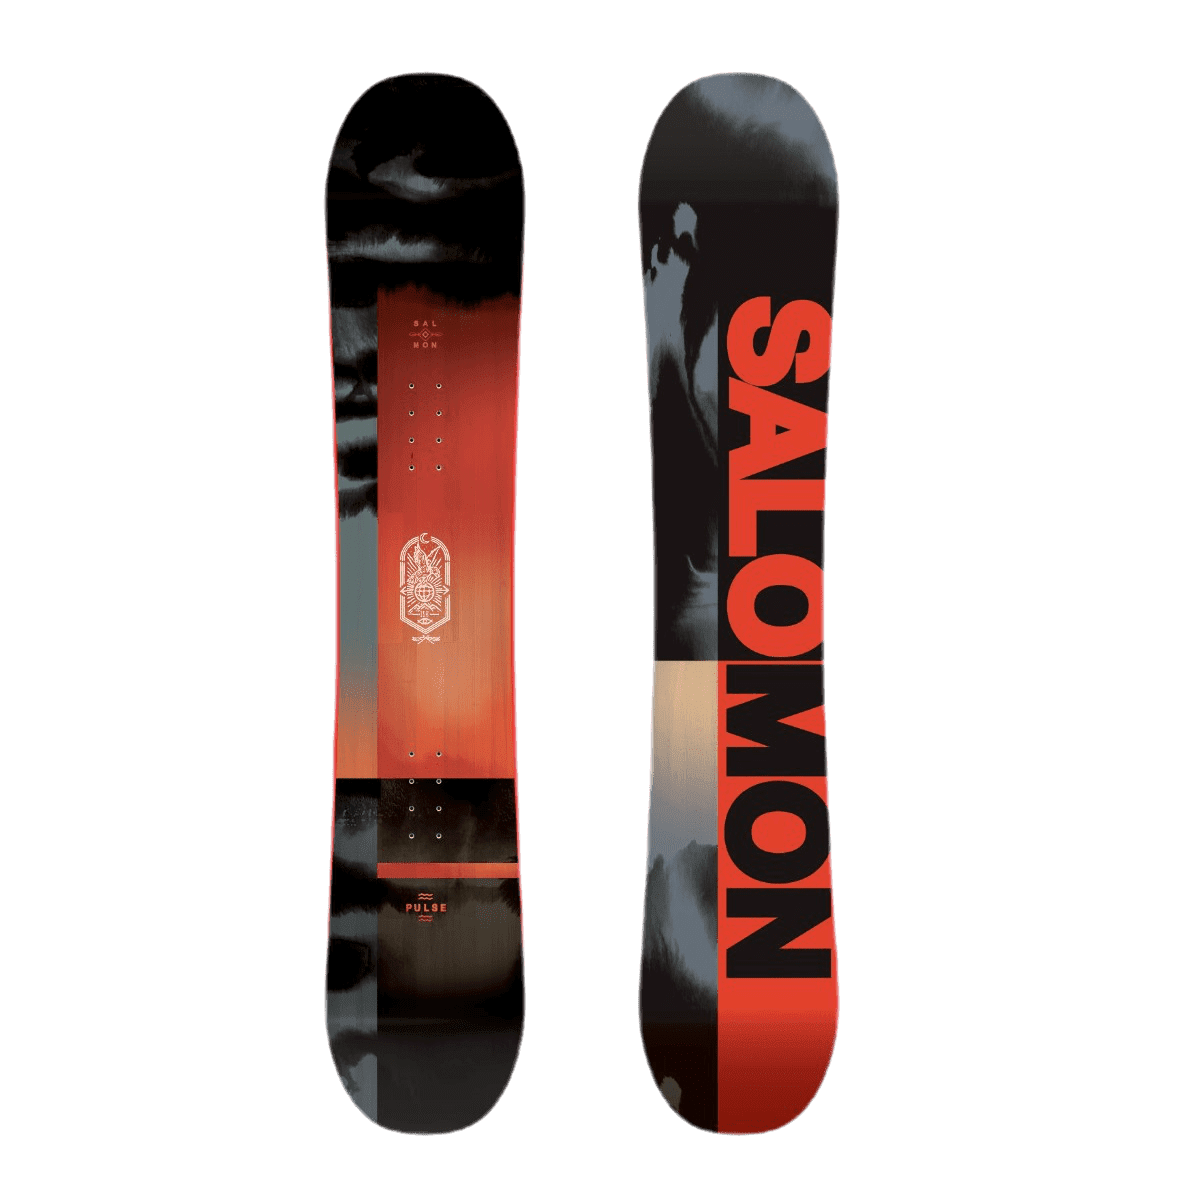 Snowboard pulse 156 m+pact black